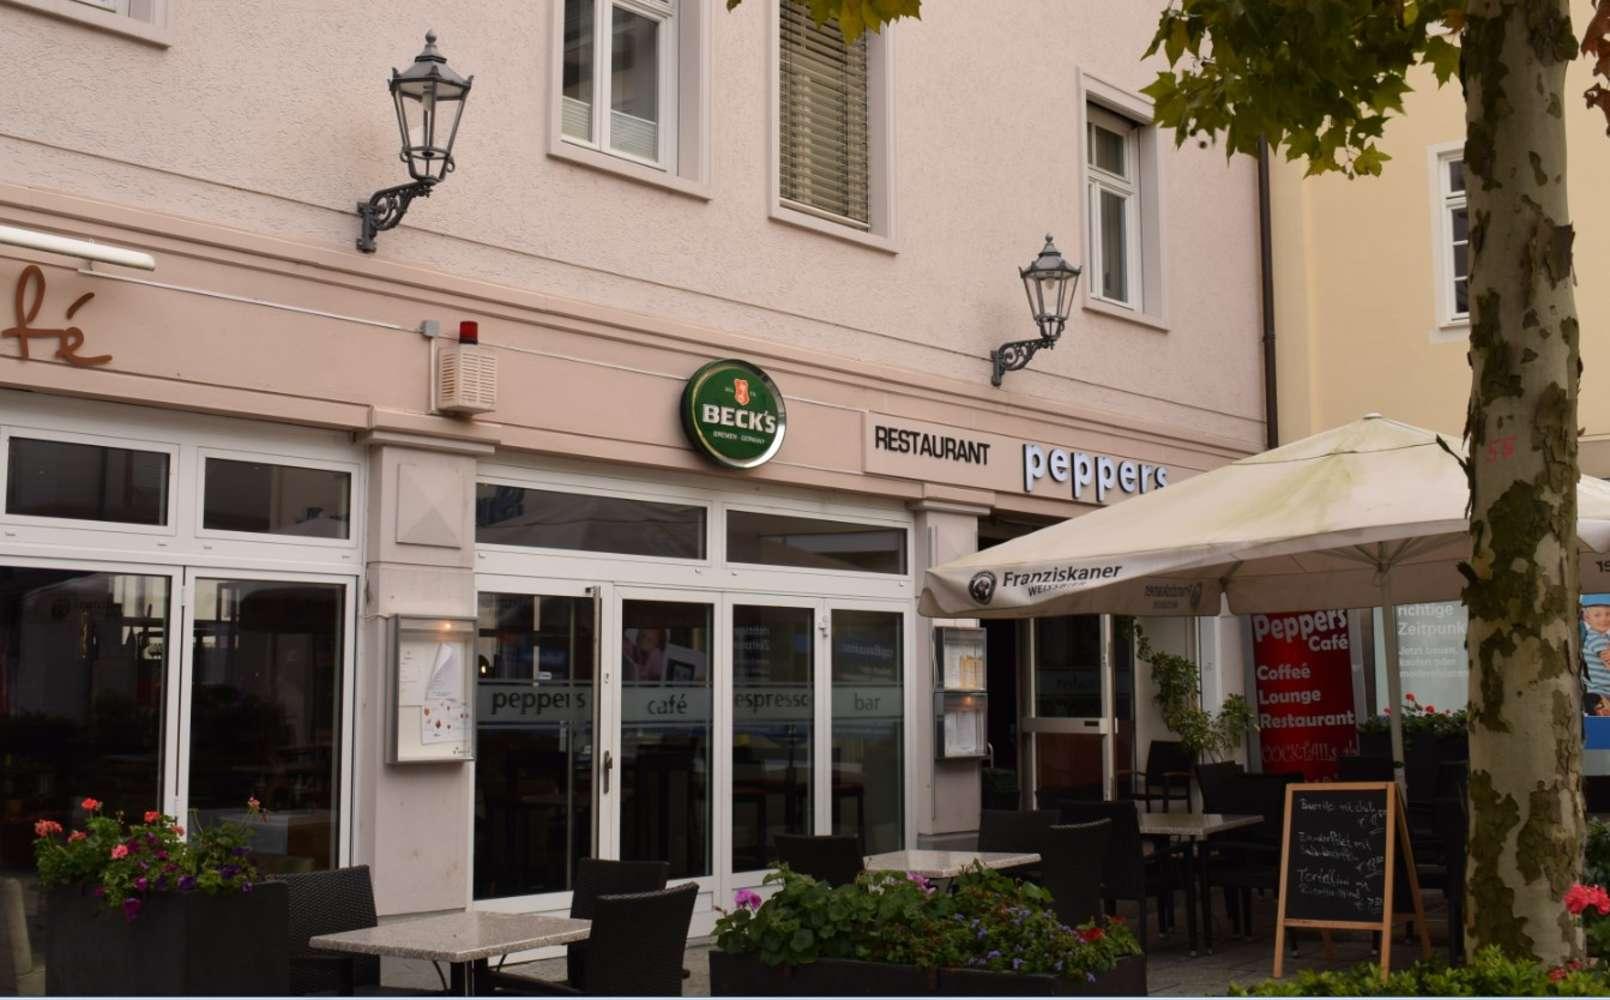 Ladenflächen Bad homburg, 61348 - Ladenfläche - Bad Homburg - E0861 - 9732732